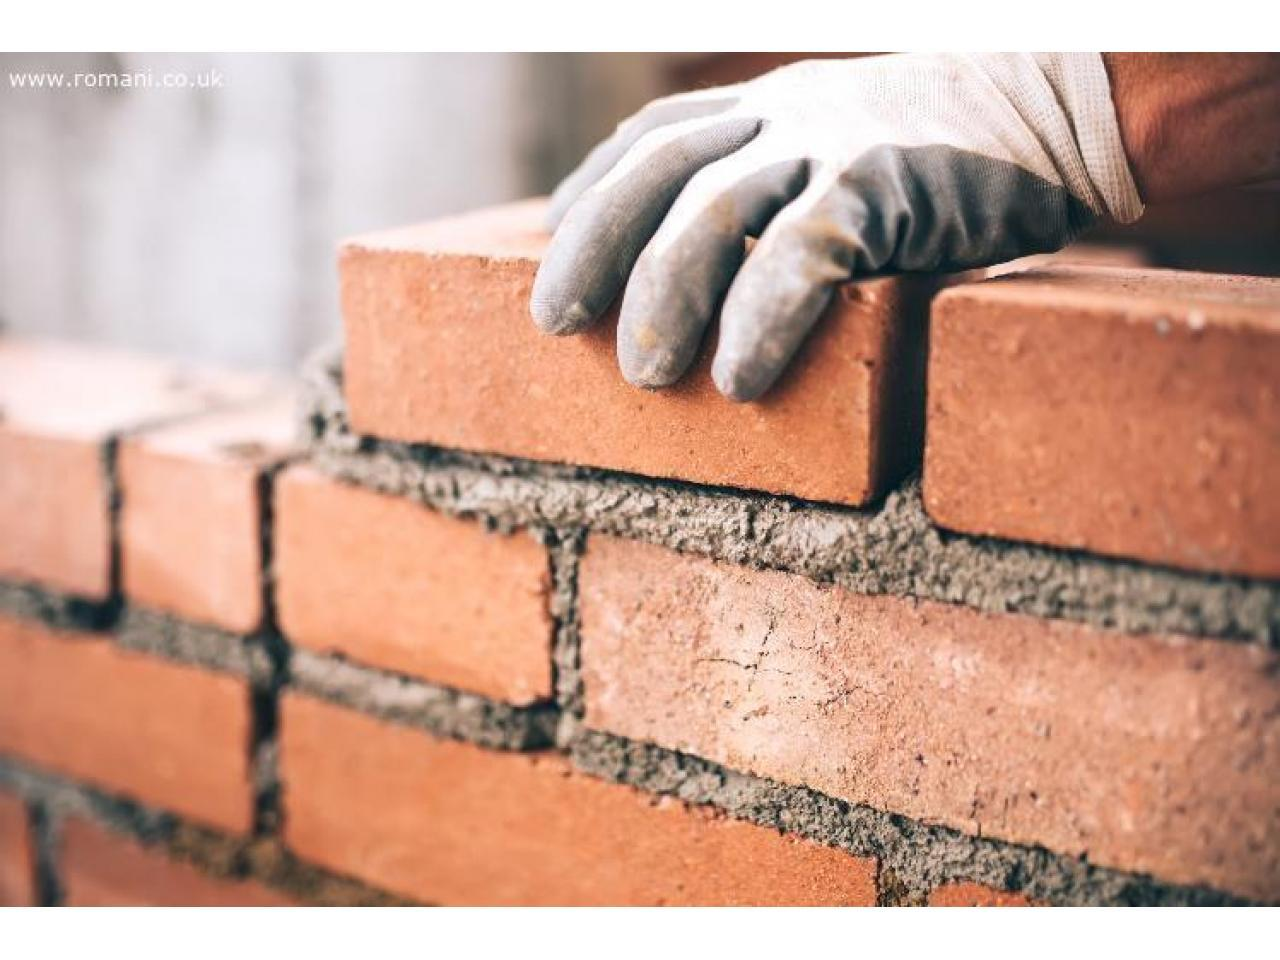 Нанимаем 2-3 каменщика( bricklayers ) - 1